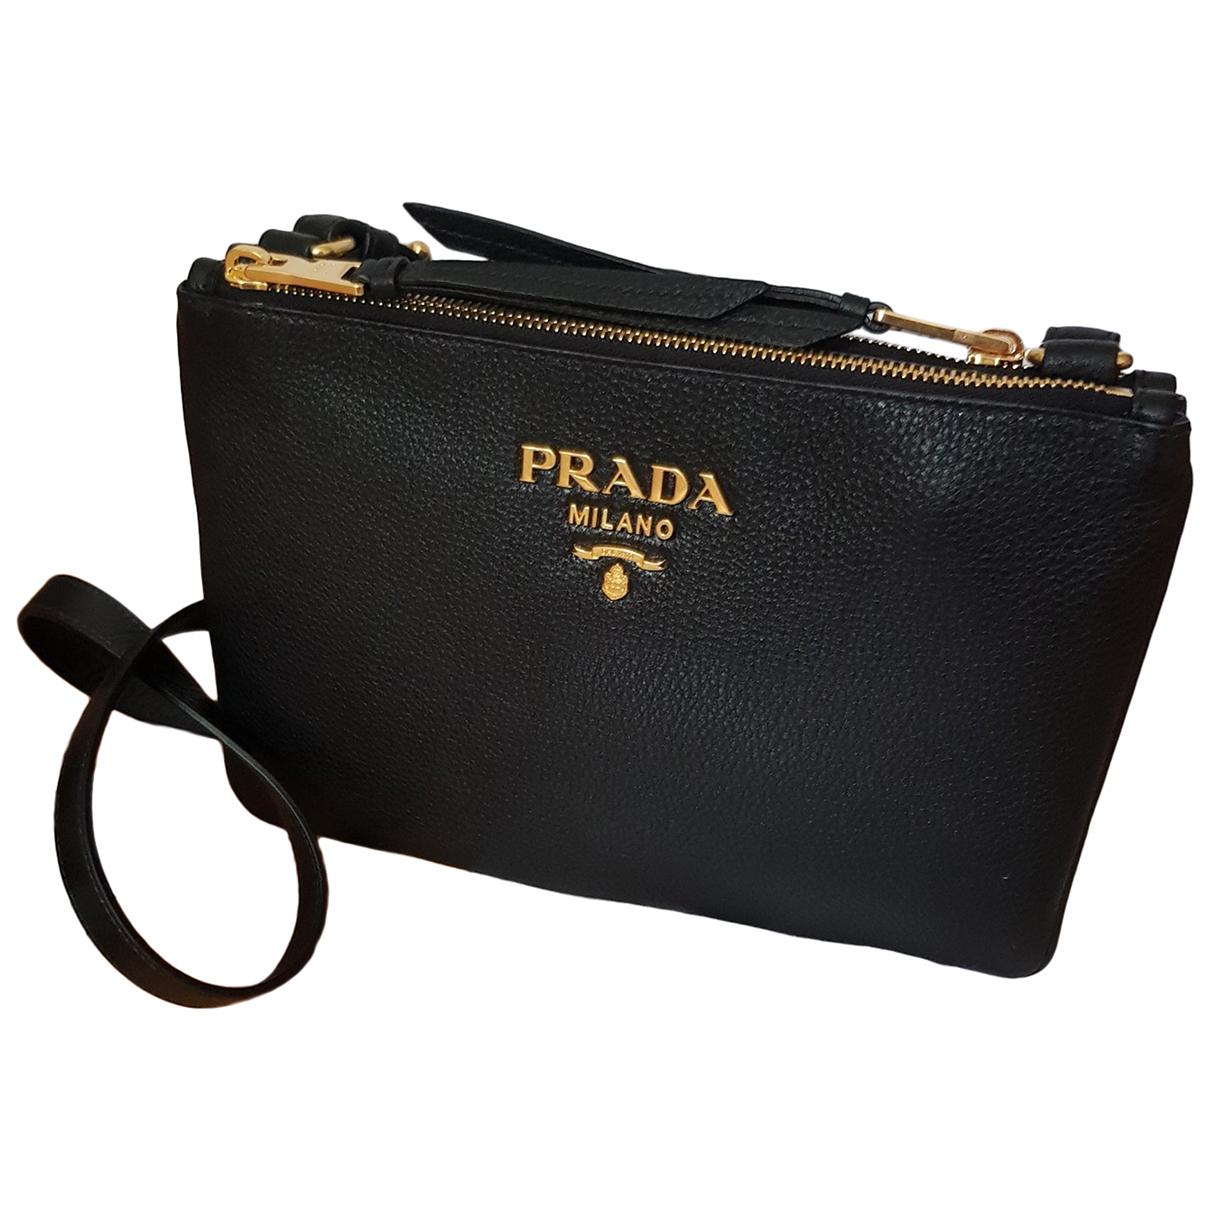 Prada Light Frame Handtasche in  Schwarz Leder